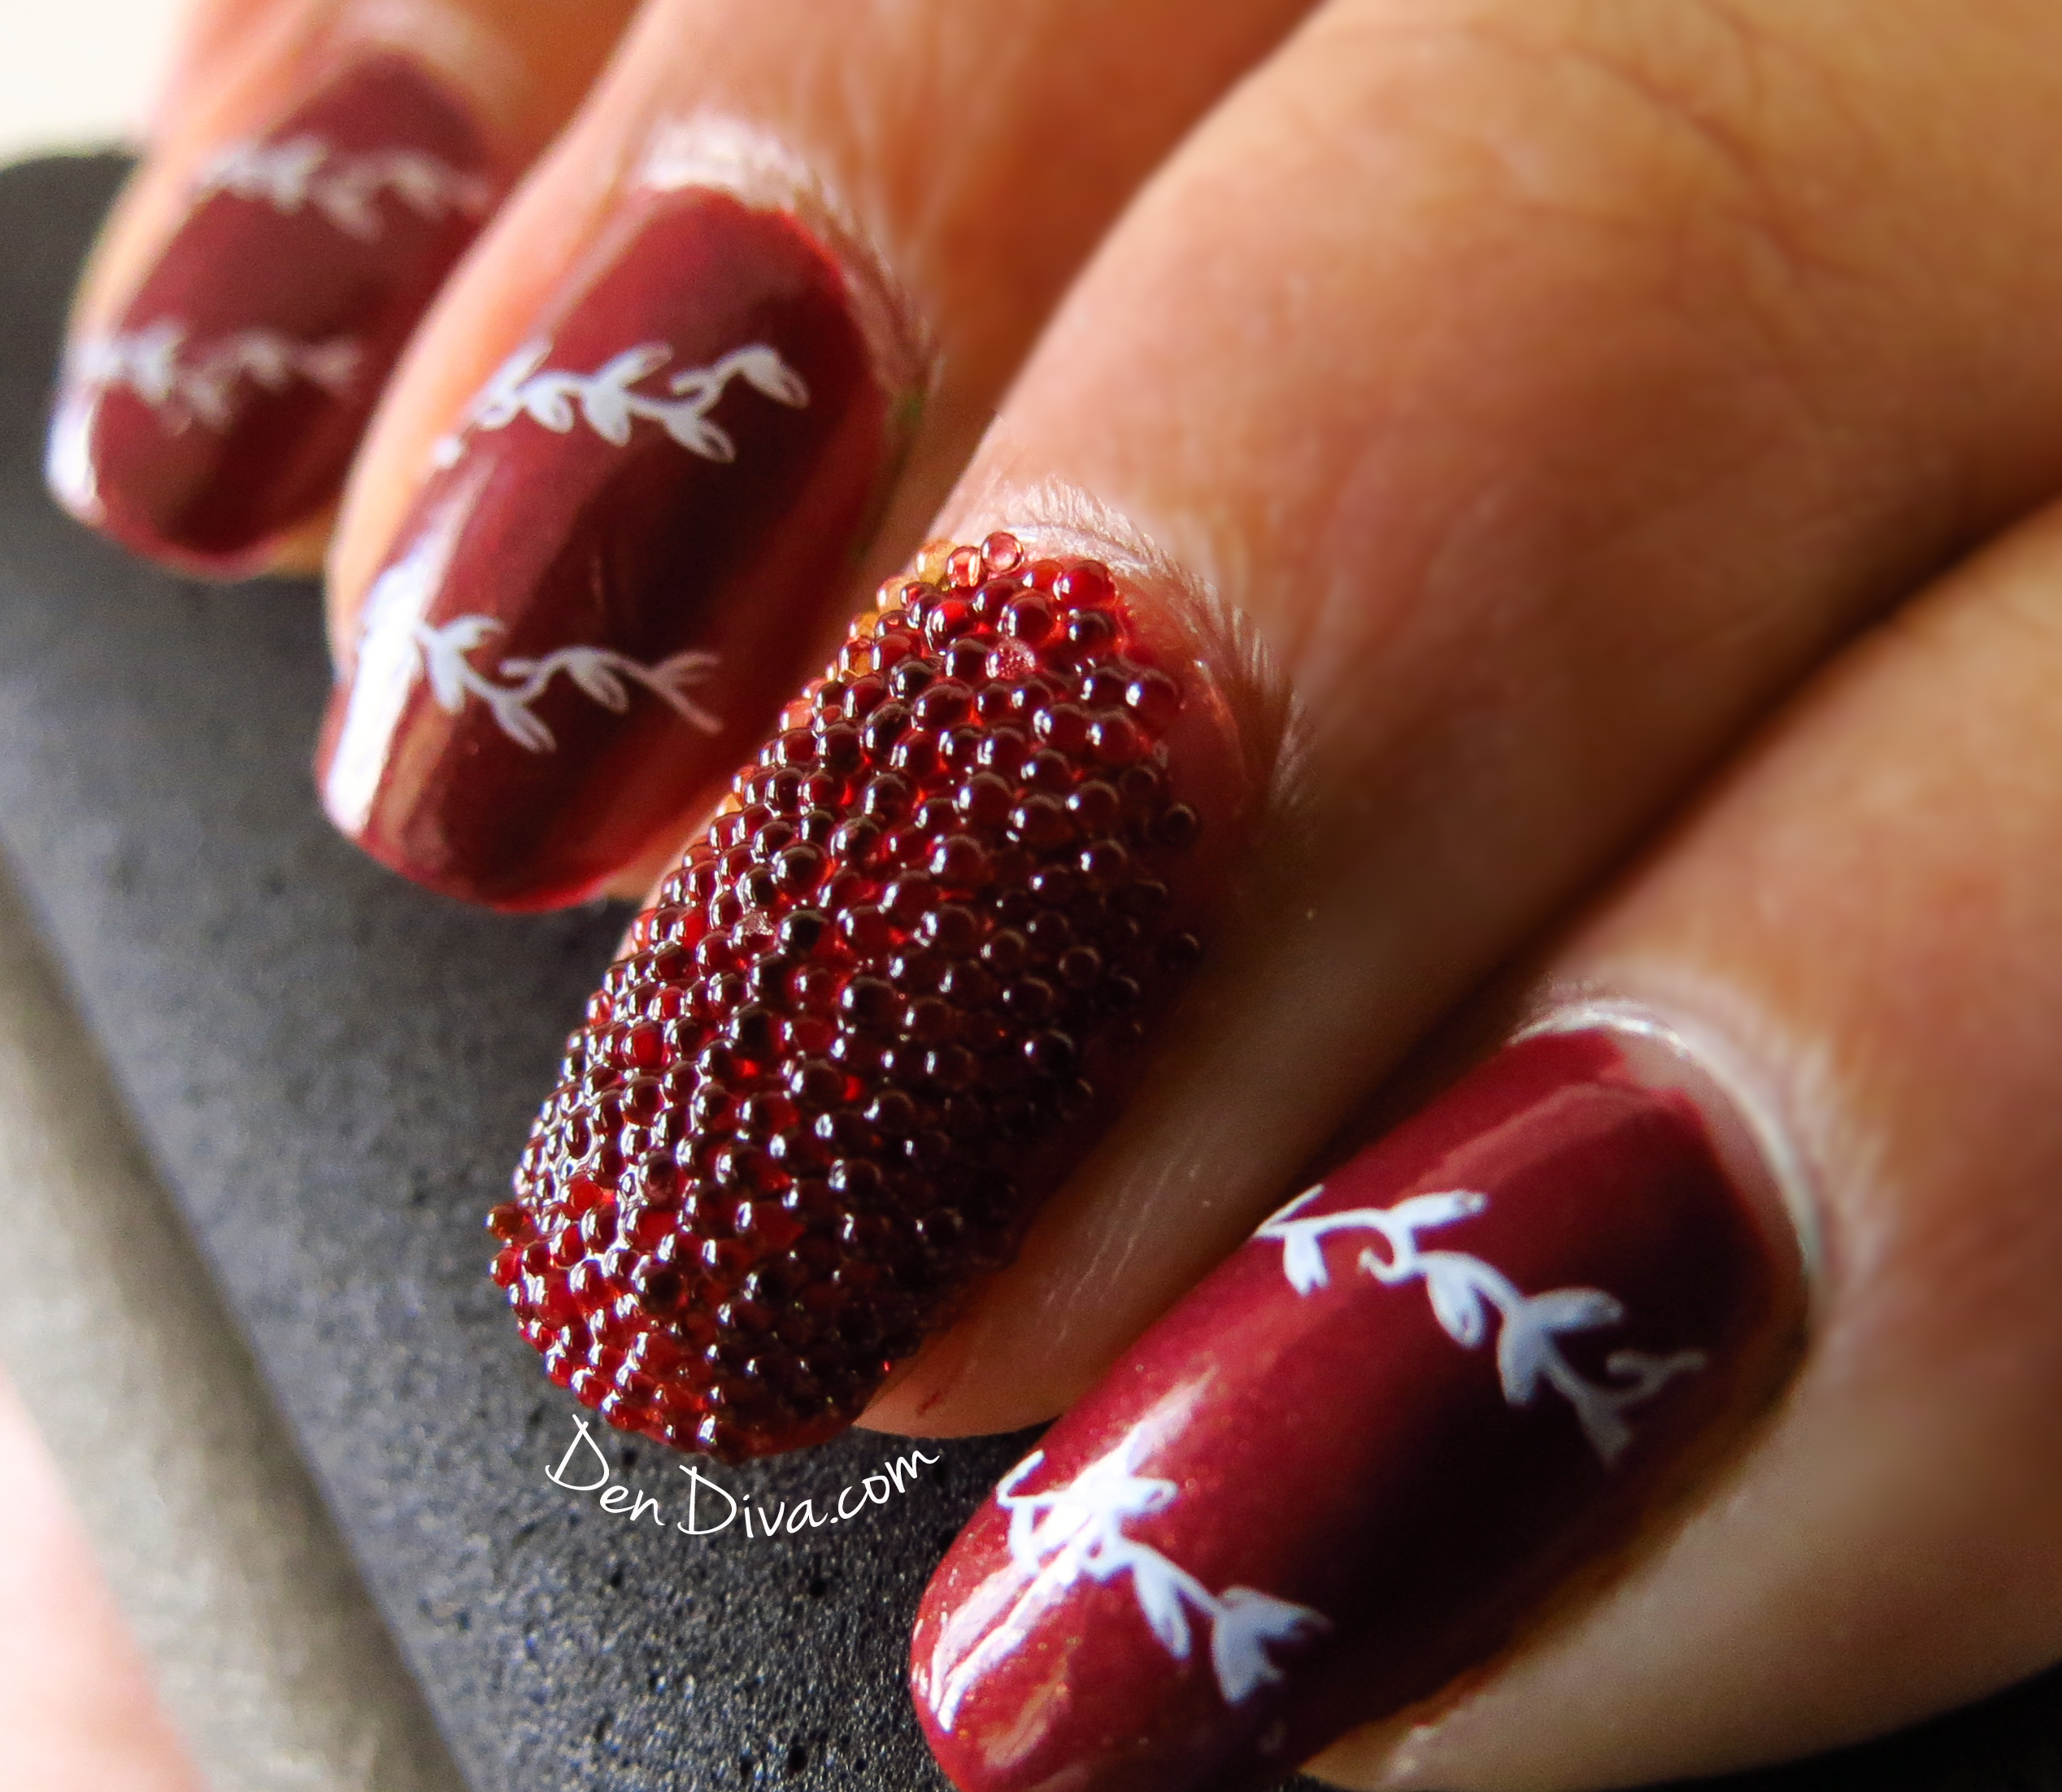 Caviar (Microbead) Nail Art